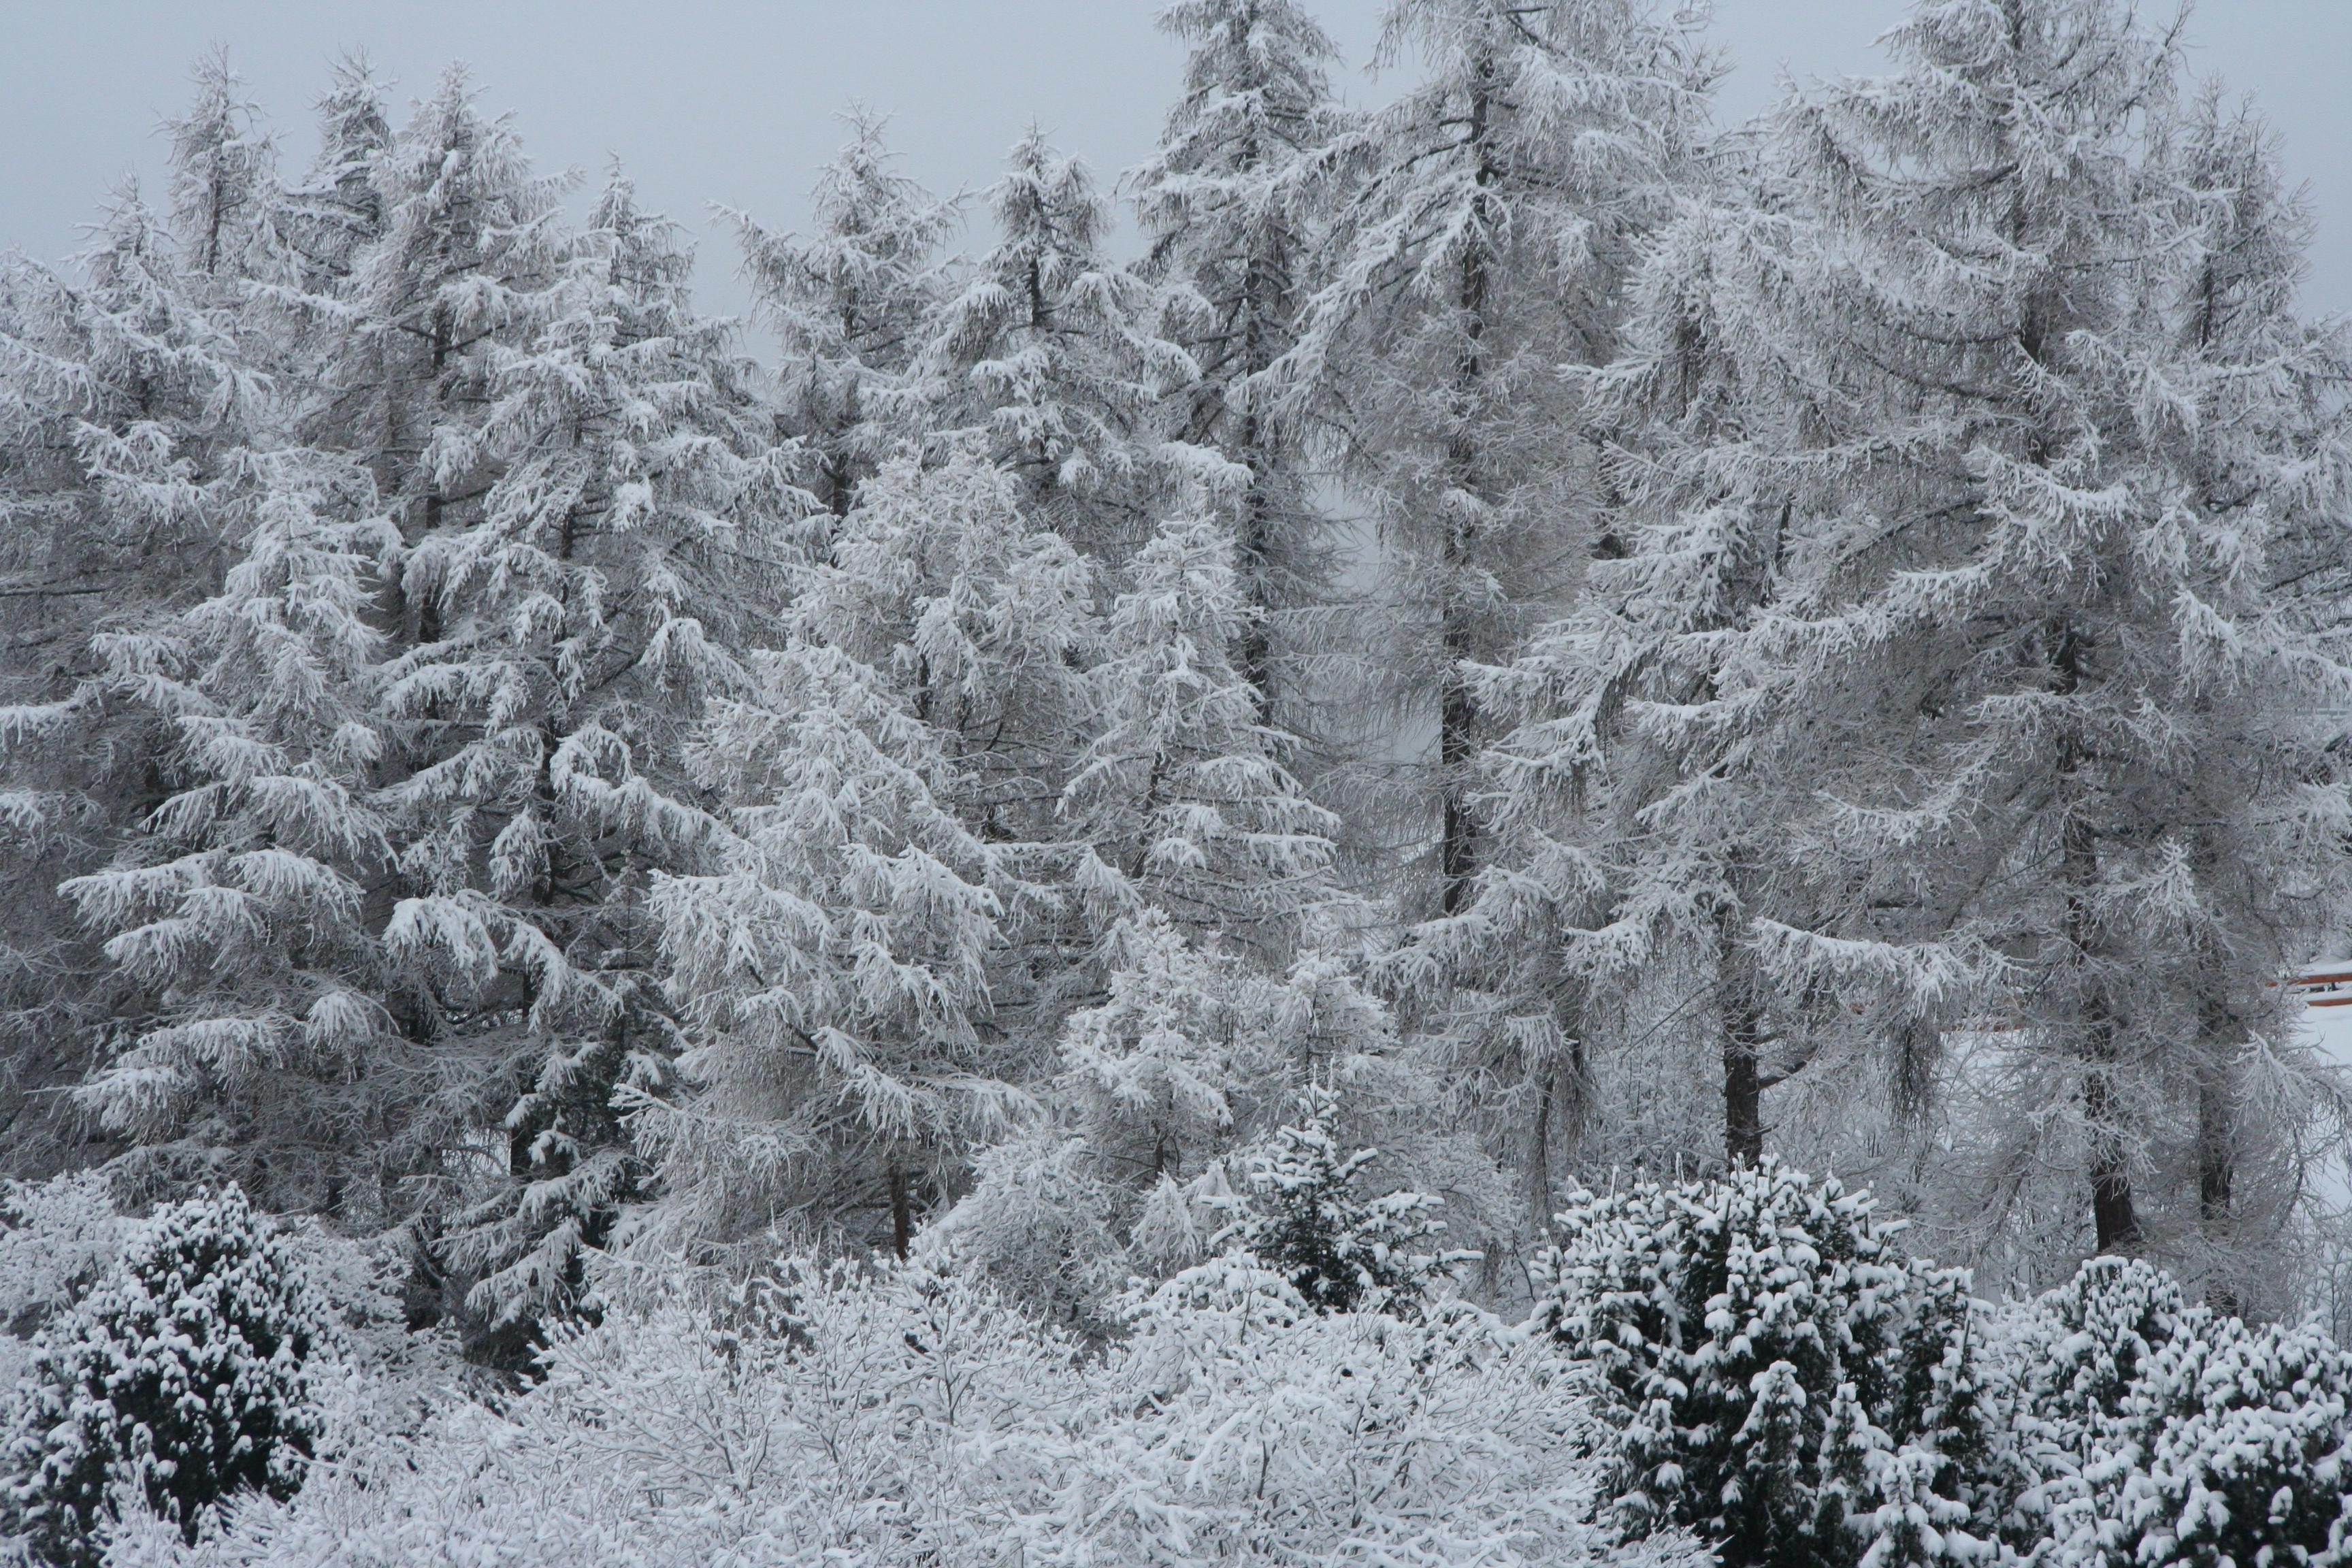 Snow on alpine trees, Nendaz